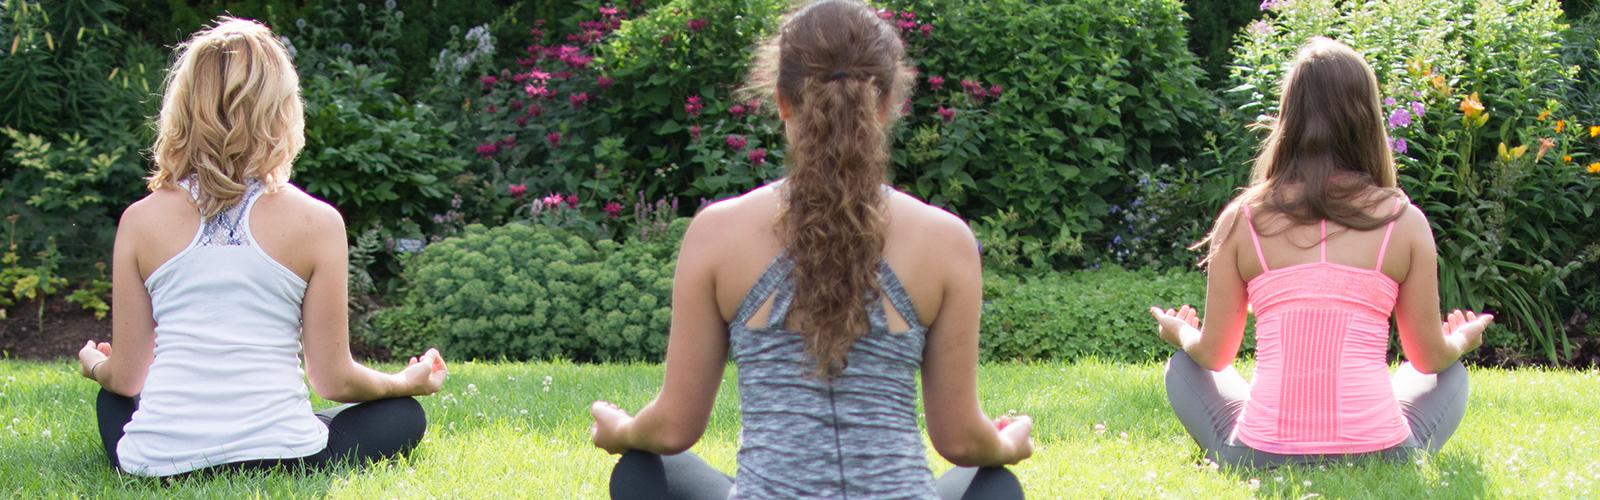 Outdoor-fitness-yoga